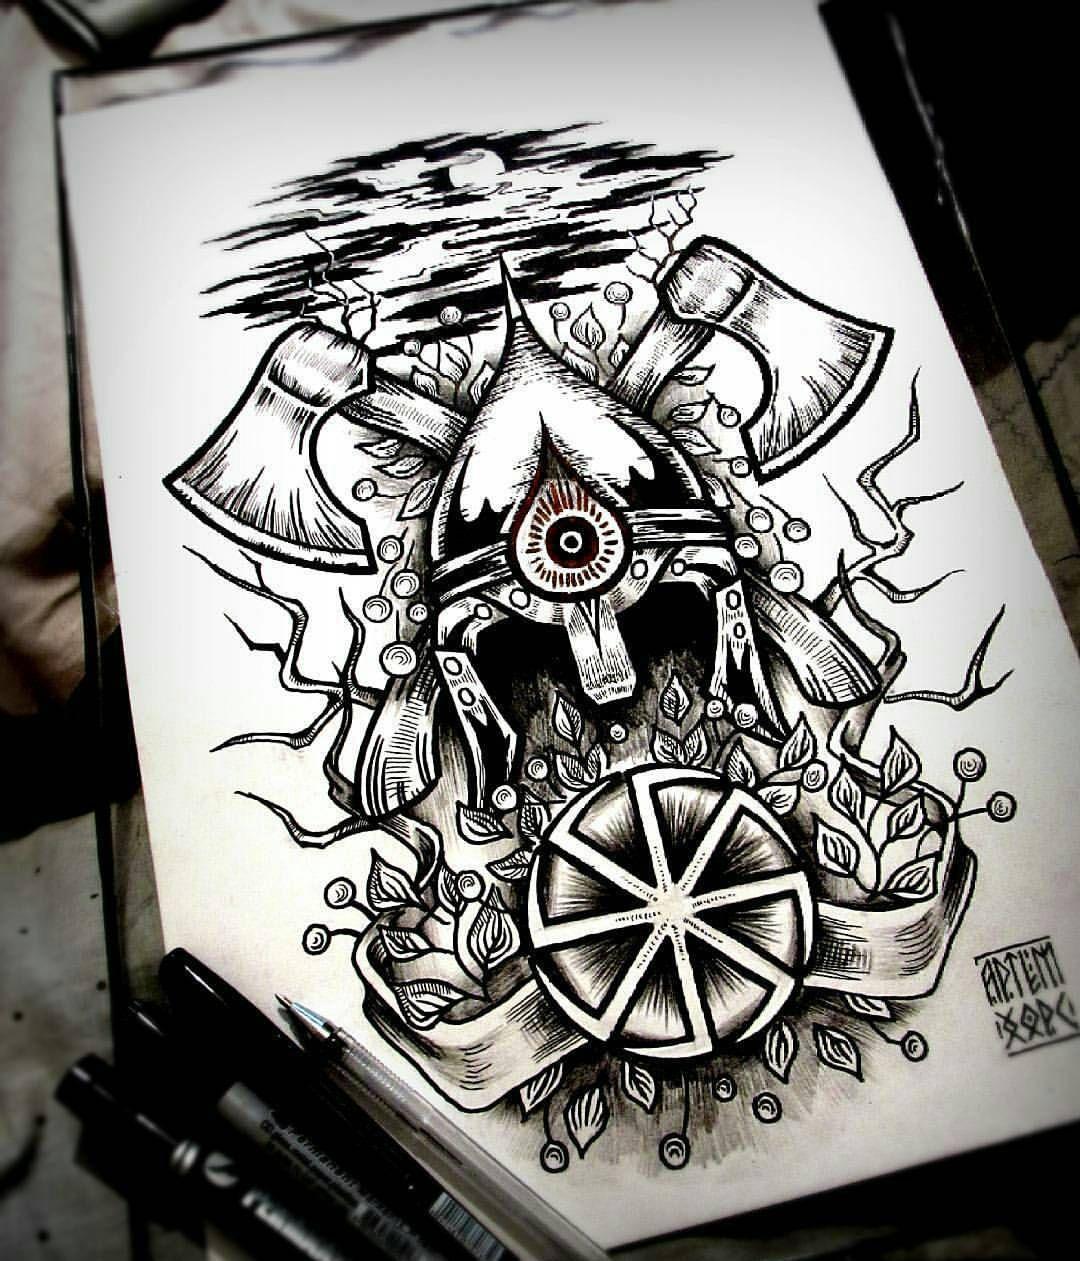 Art By At Artemhors шлем эскиз топоры славянскийстиль